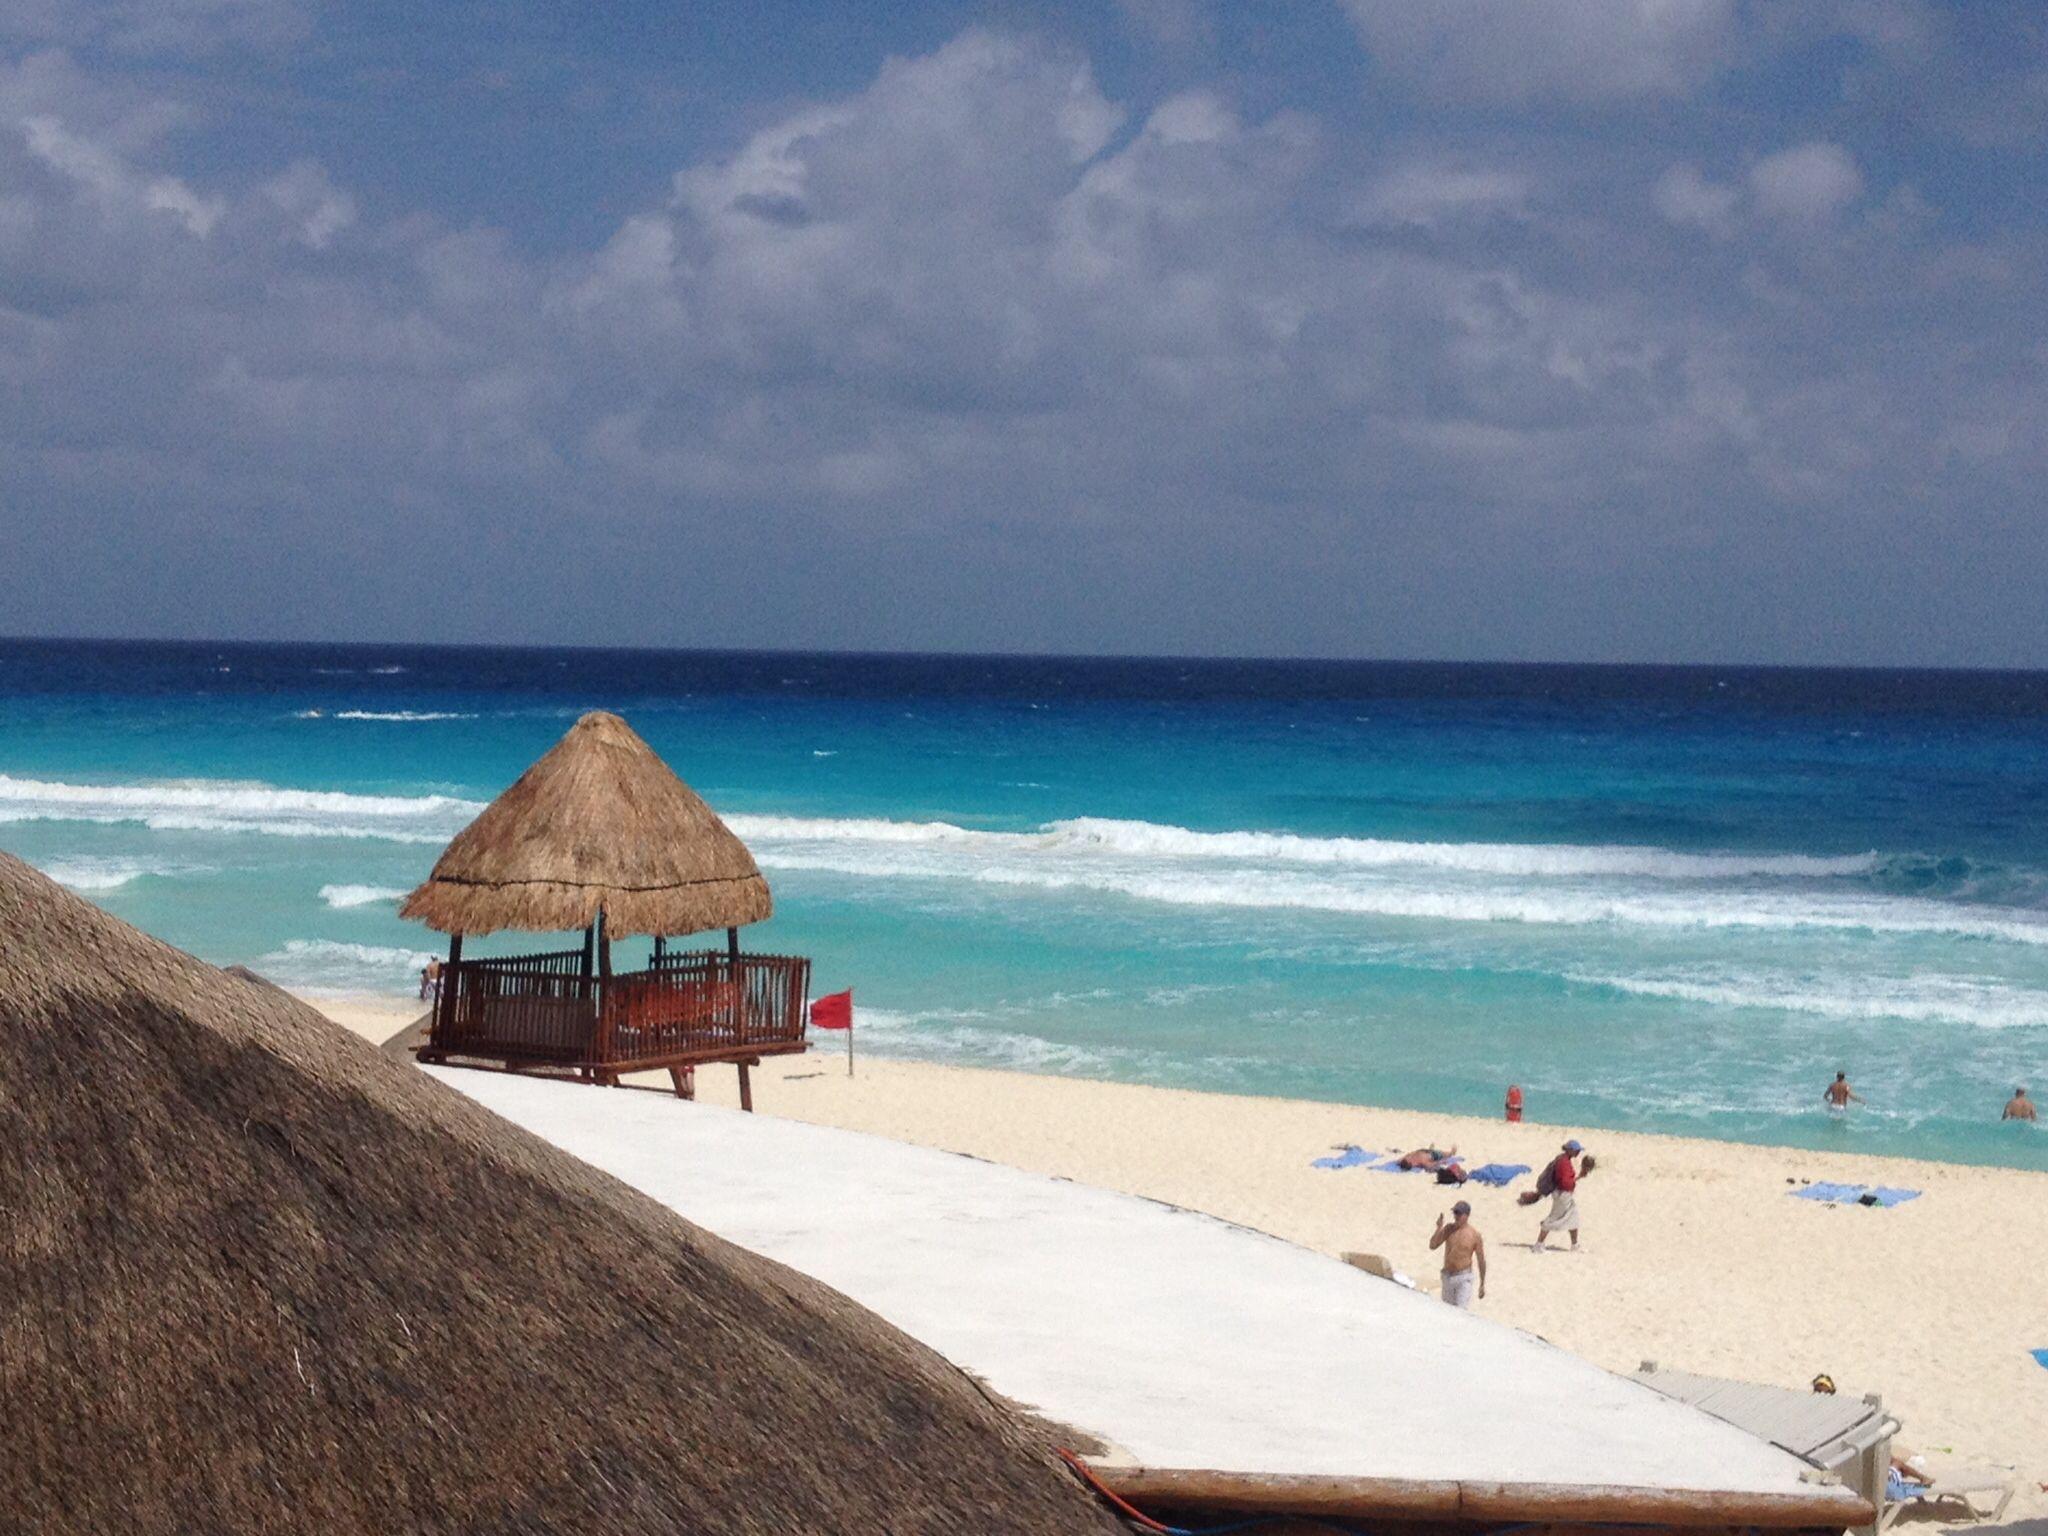 Pin By Visit Cancun On Beaches Beautiful Beaches Beaches In The World Most Beautiful Beaches